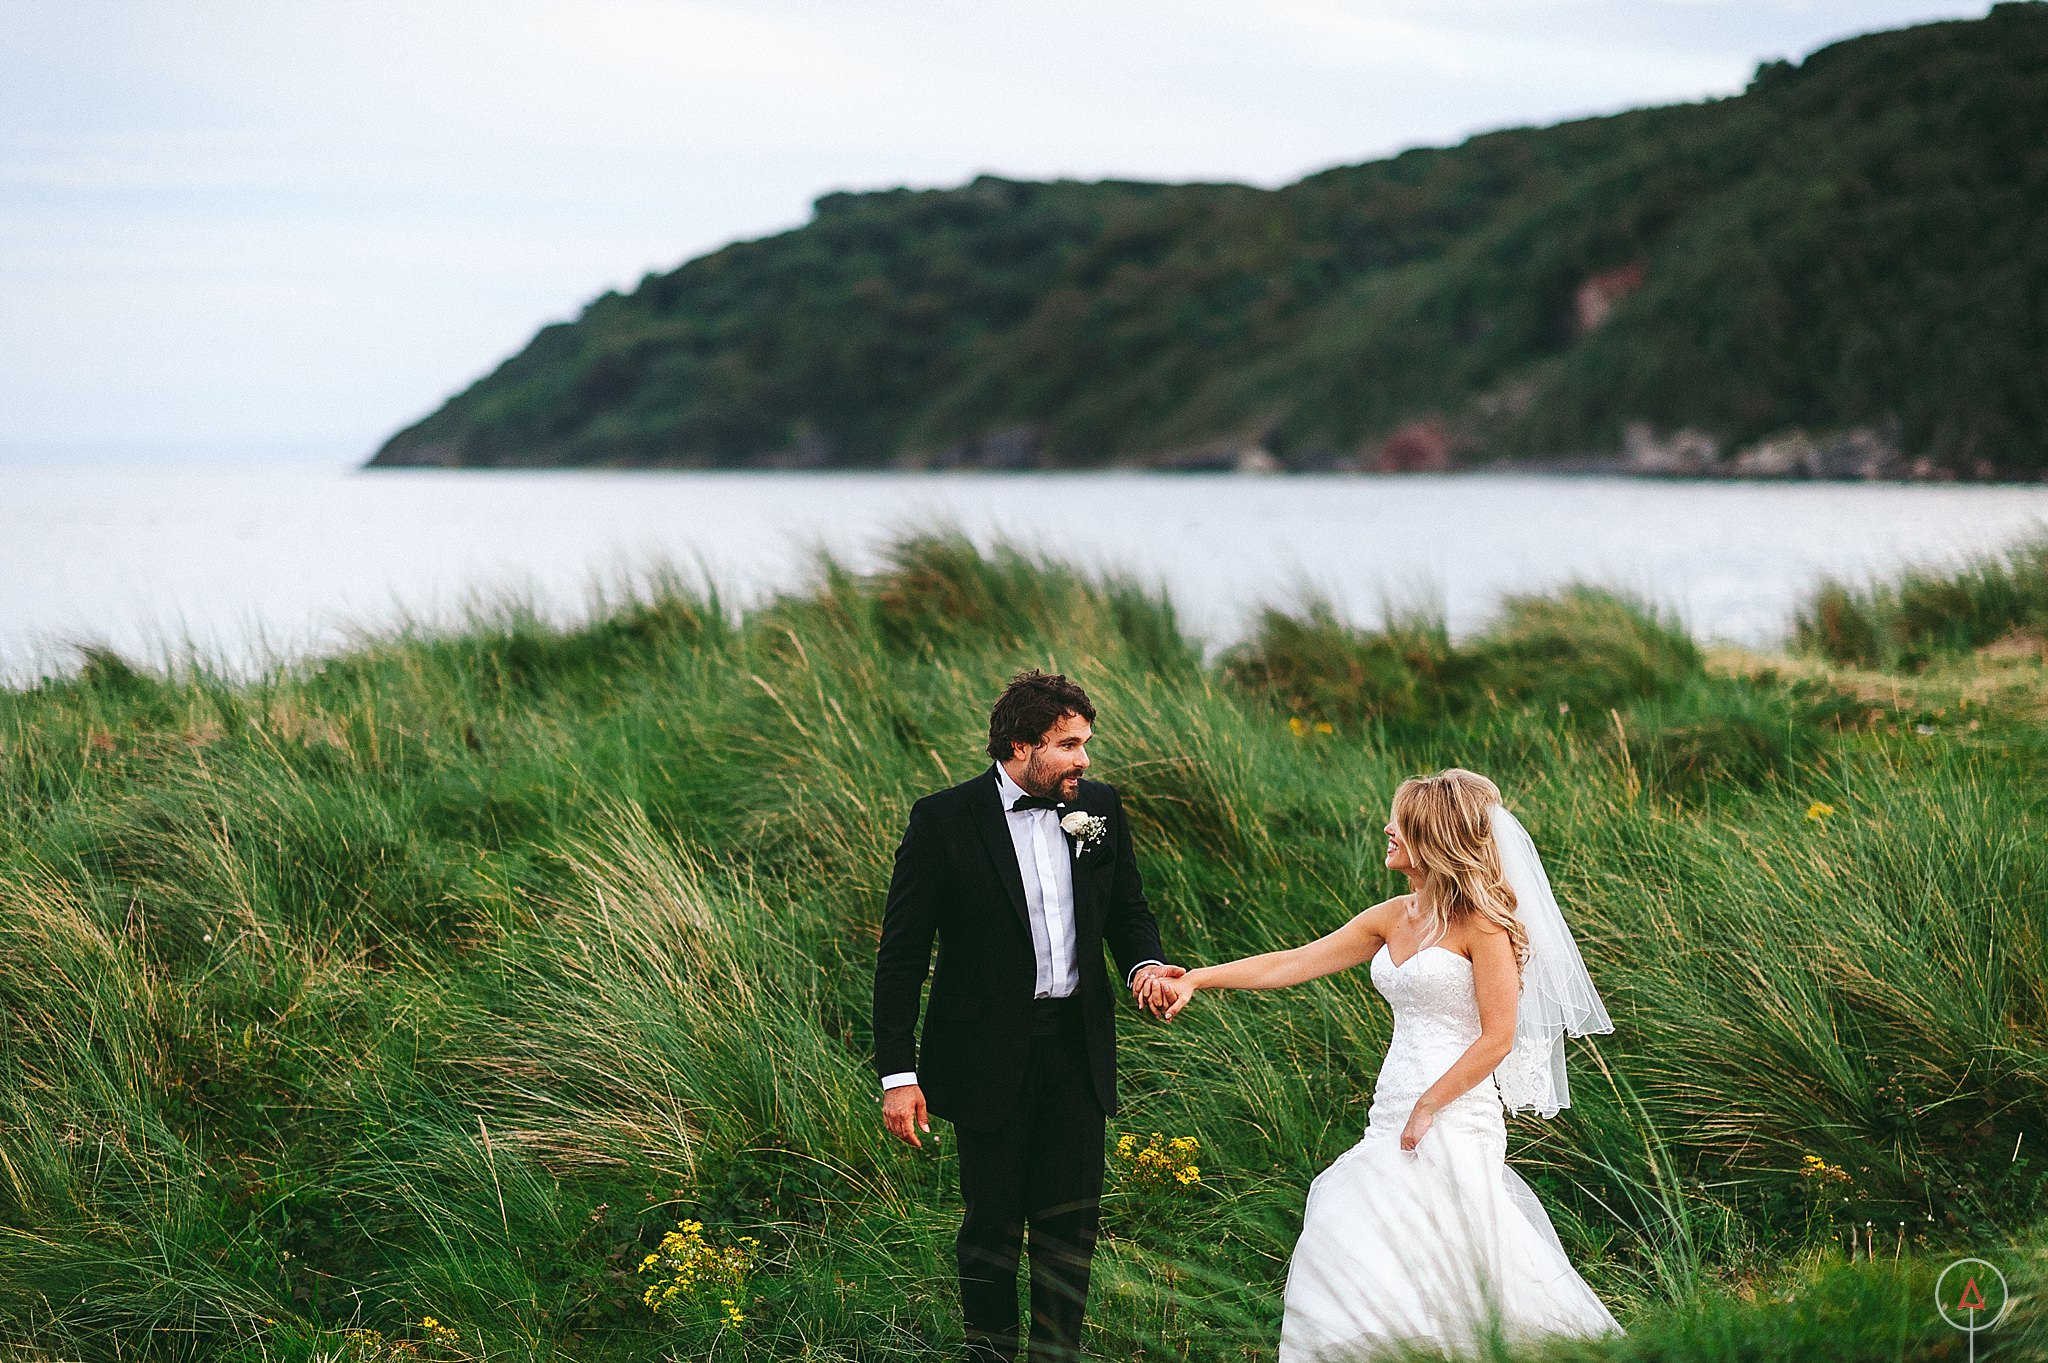 cardiff-wedding-photographer-aga-tomaszek_0402